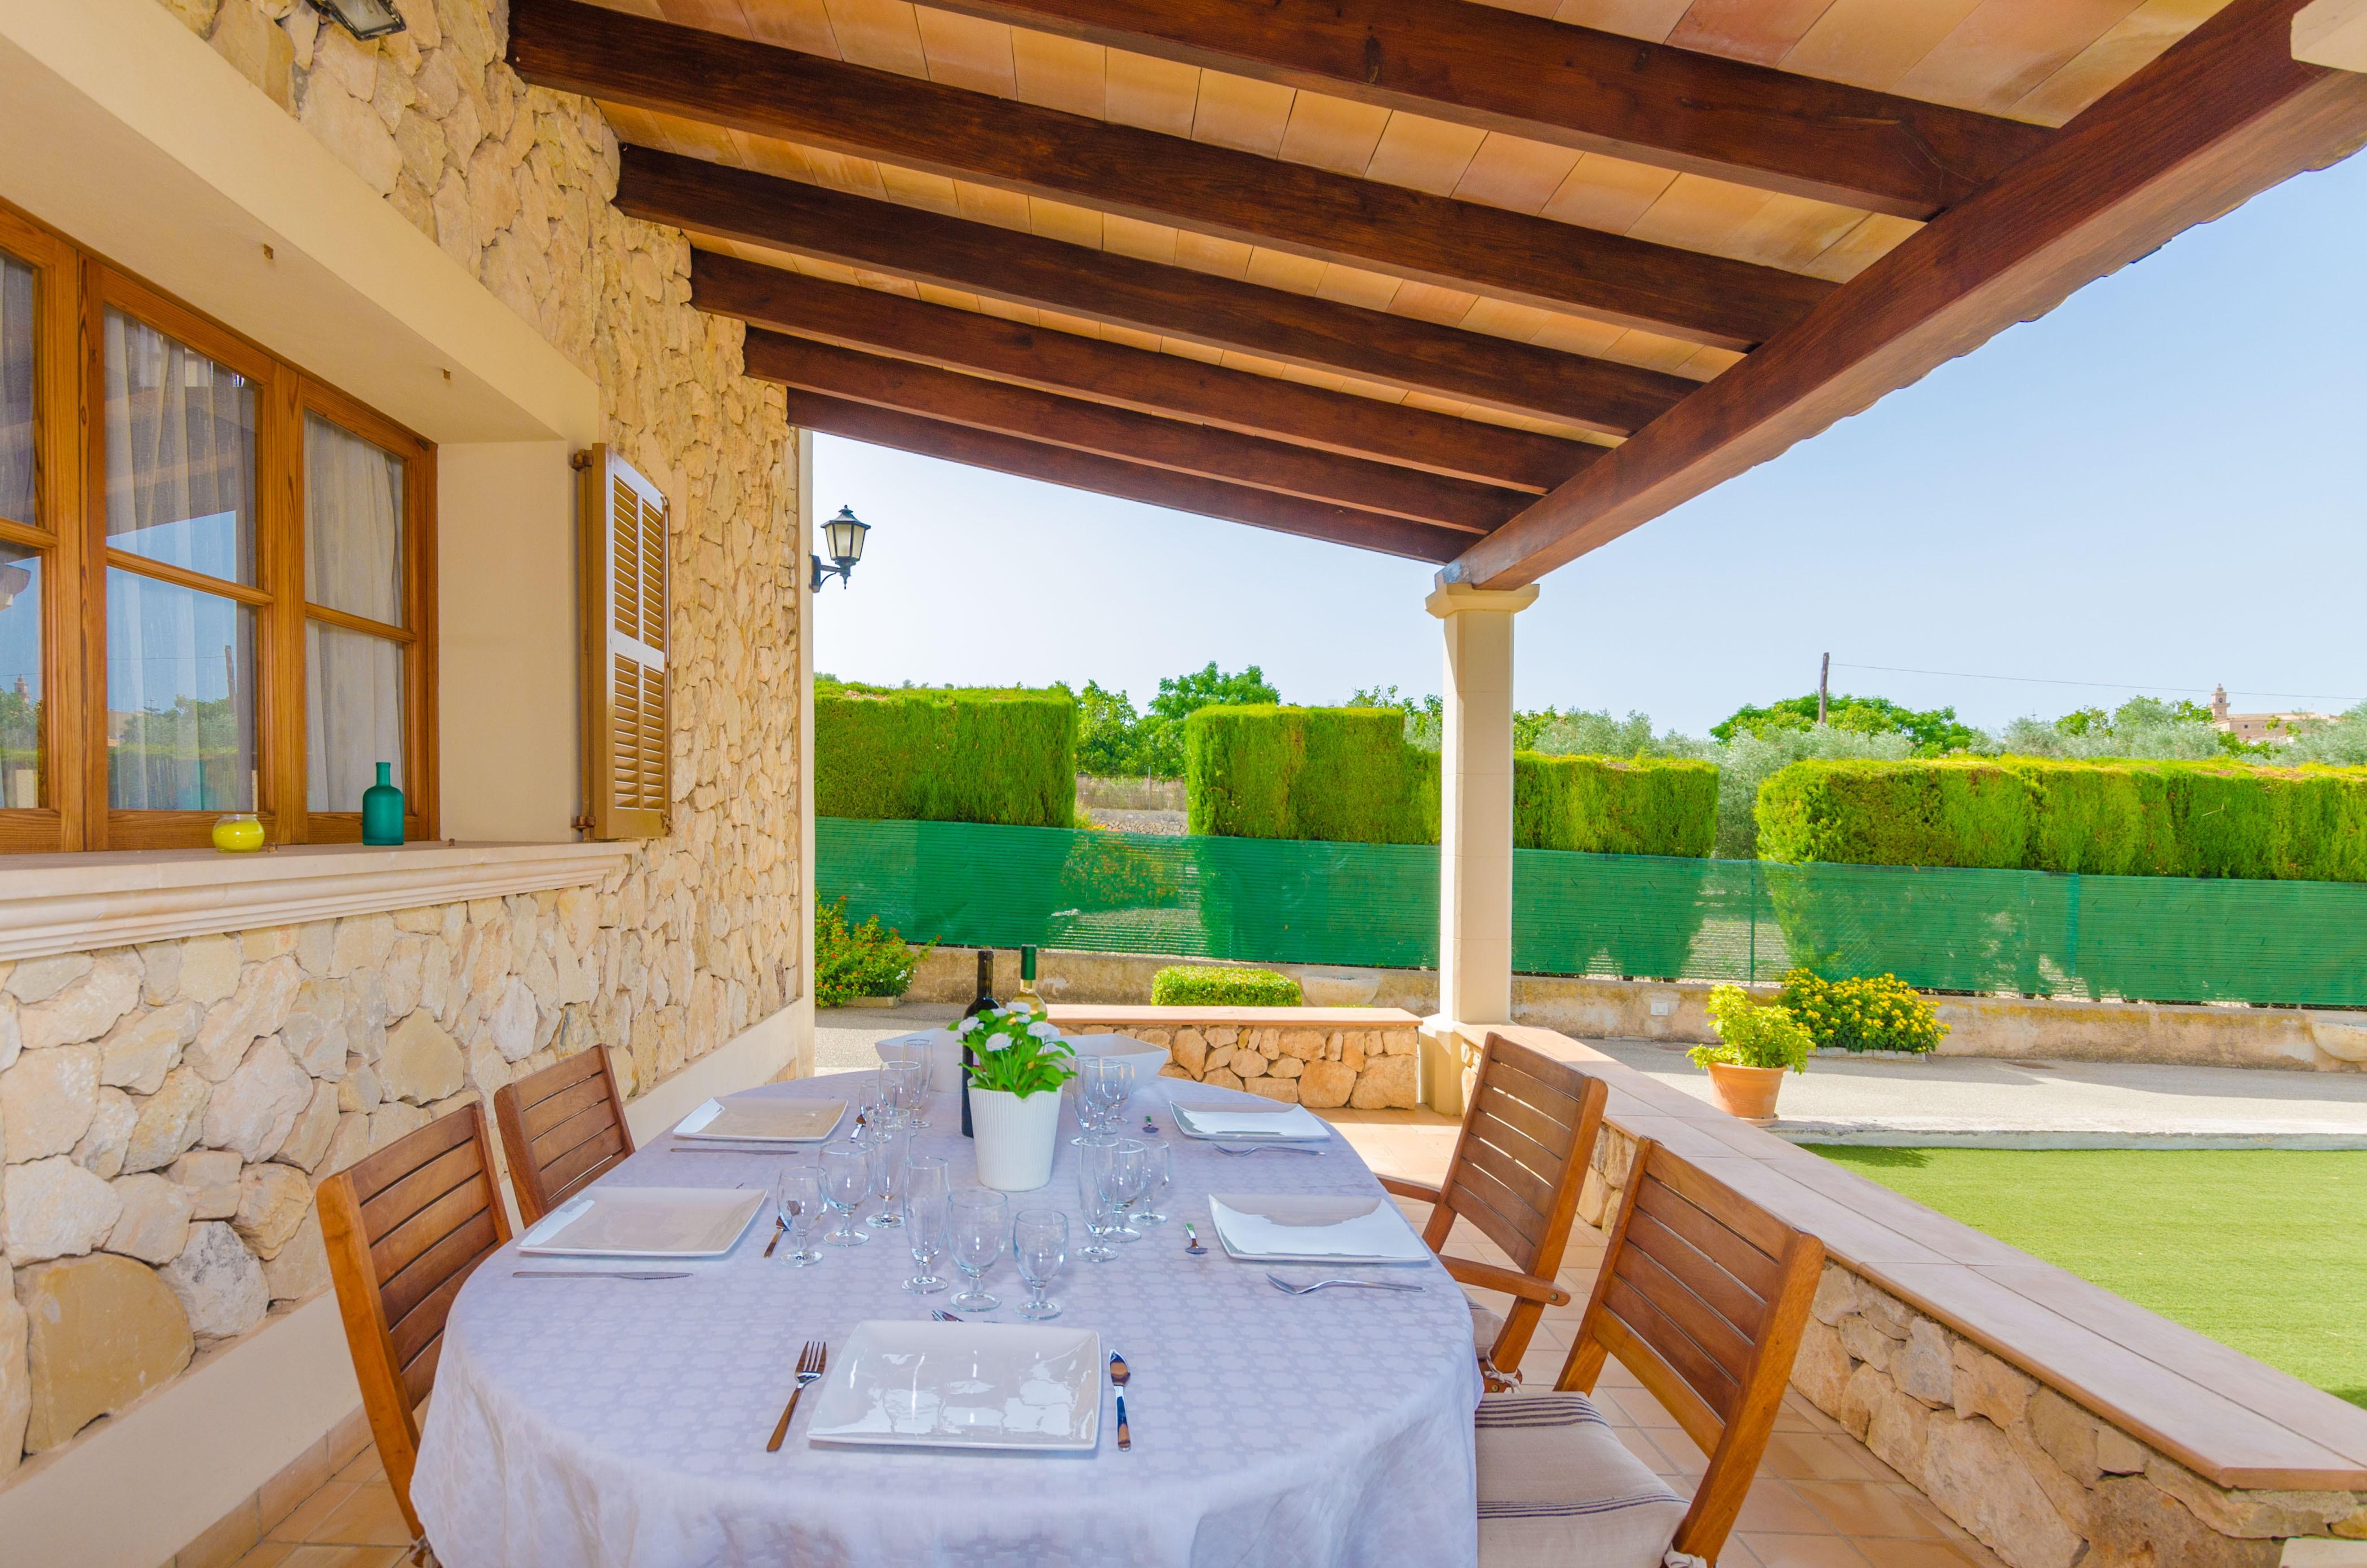 Maison de vacances SA SINIA (2374876), Lloret de Vistalegre, Majorque, Iles Baléares, Espagne, image 55